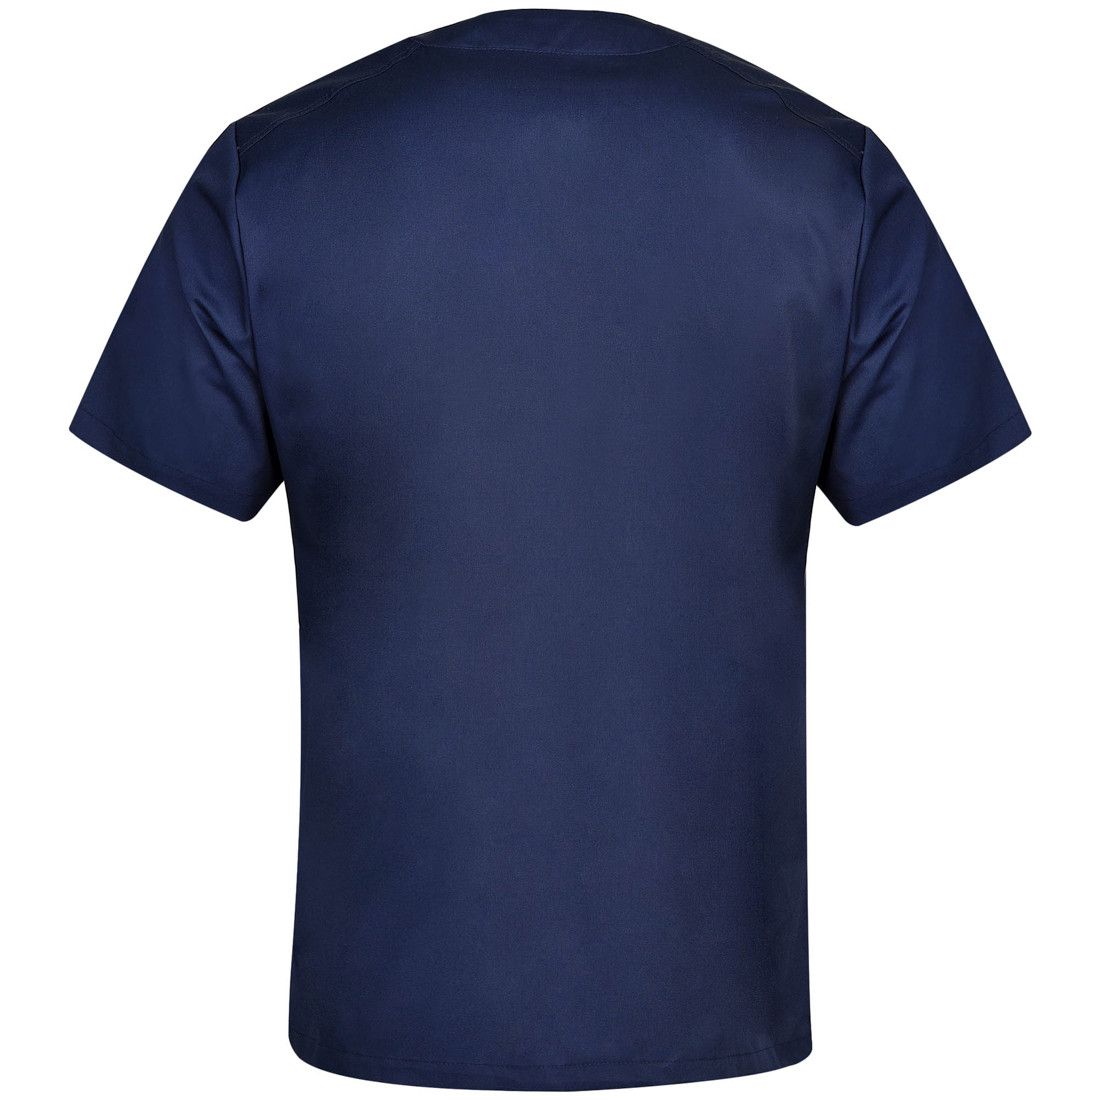 Tunica medicala de barbati MARCO - Imbracaminte de protectie